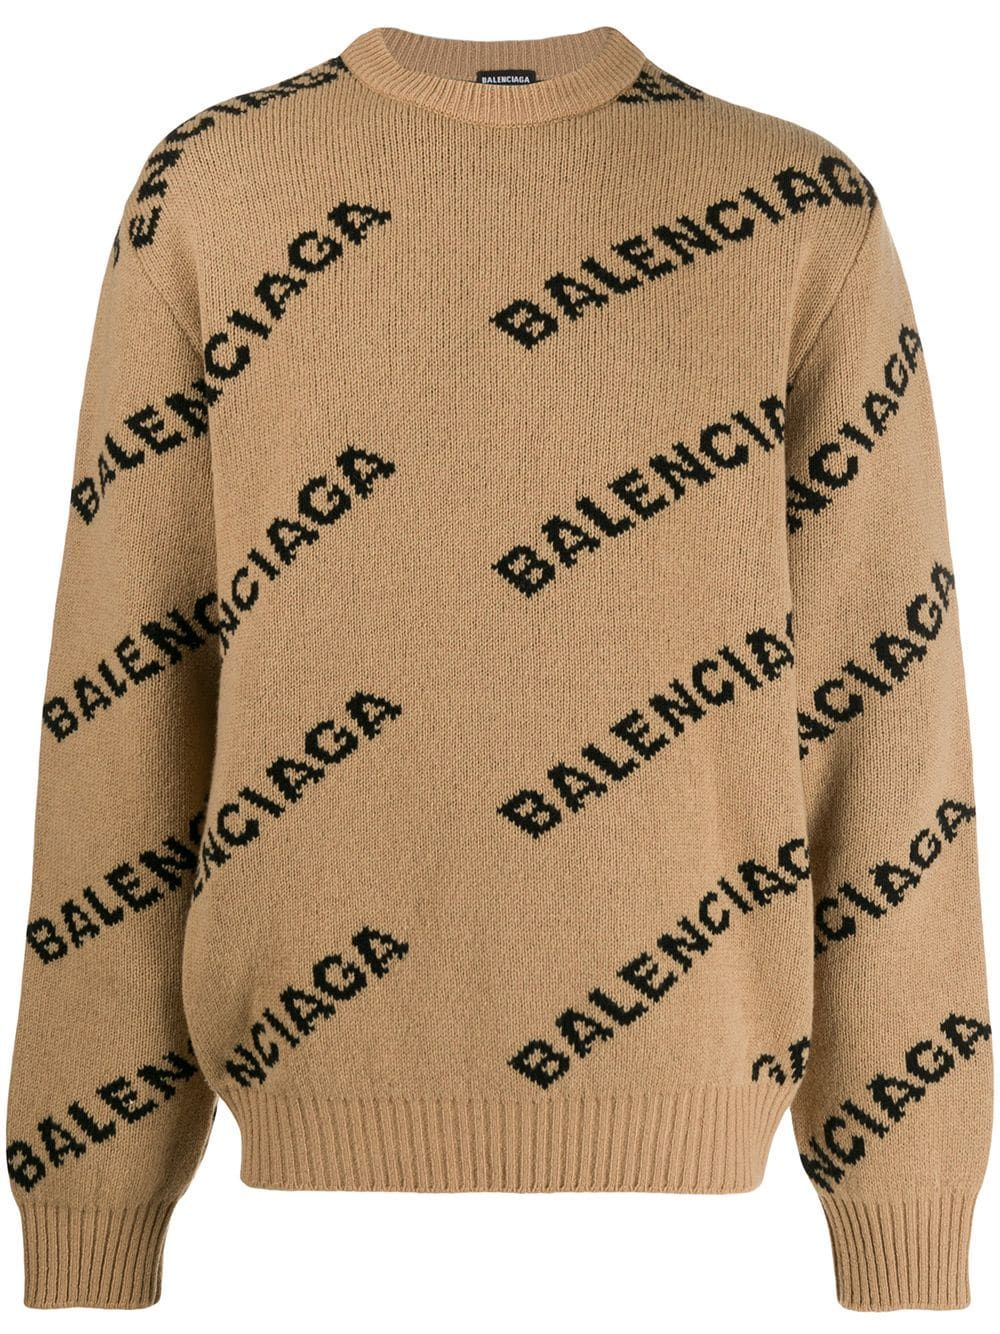 Balenciaga Logo Intarsia Jumper Farfetch Balenciaga Clothing Balenciaga Jumper Wool Blend Sweater [ 1334 x 1000 Pixel ]